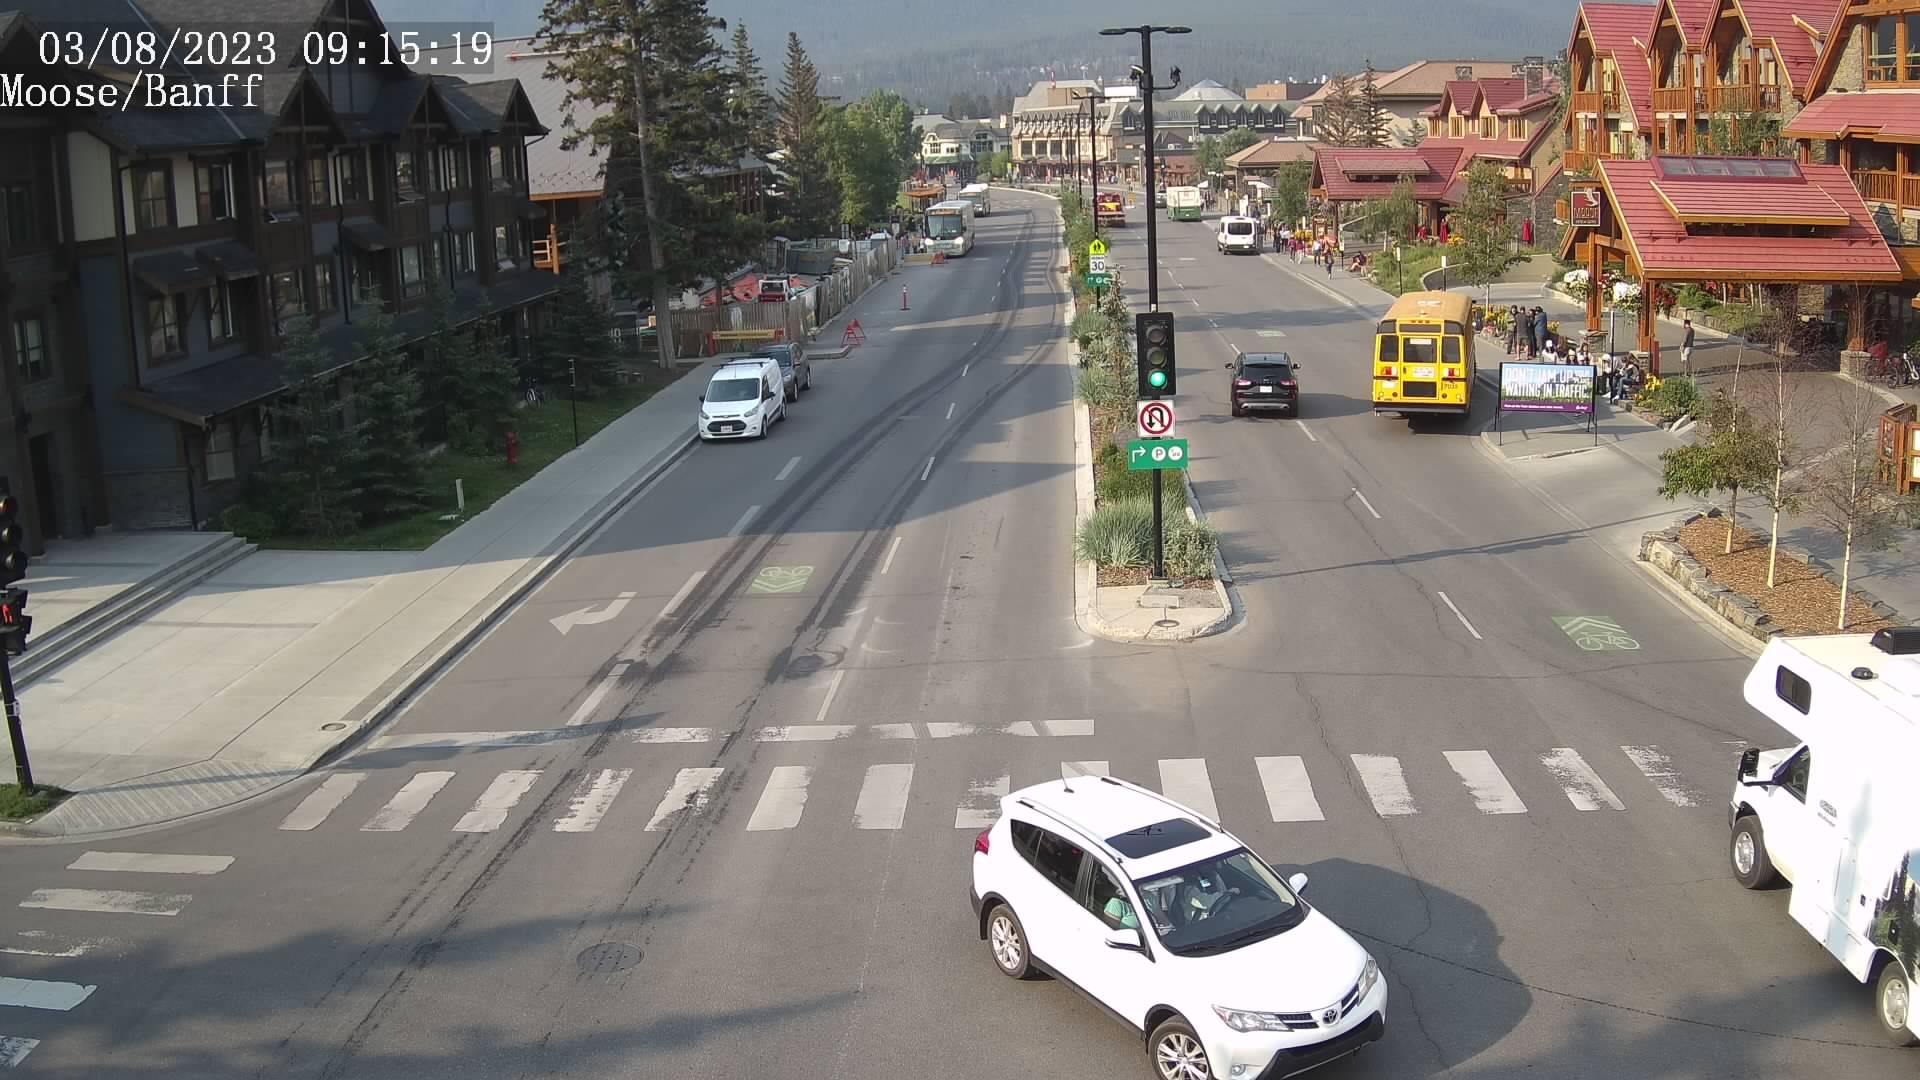 Banff1cam  3